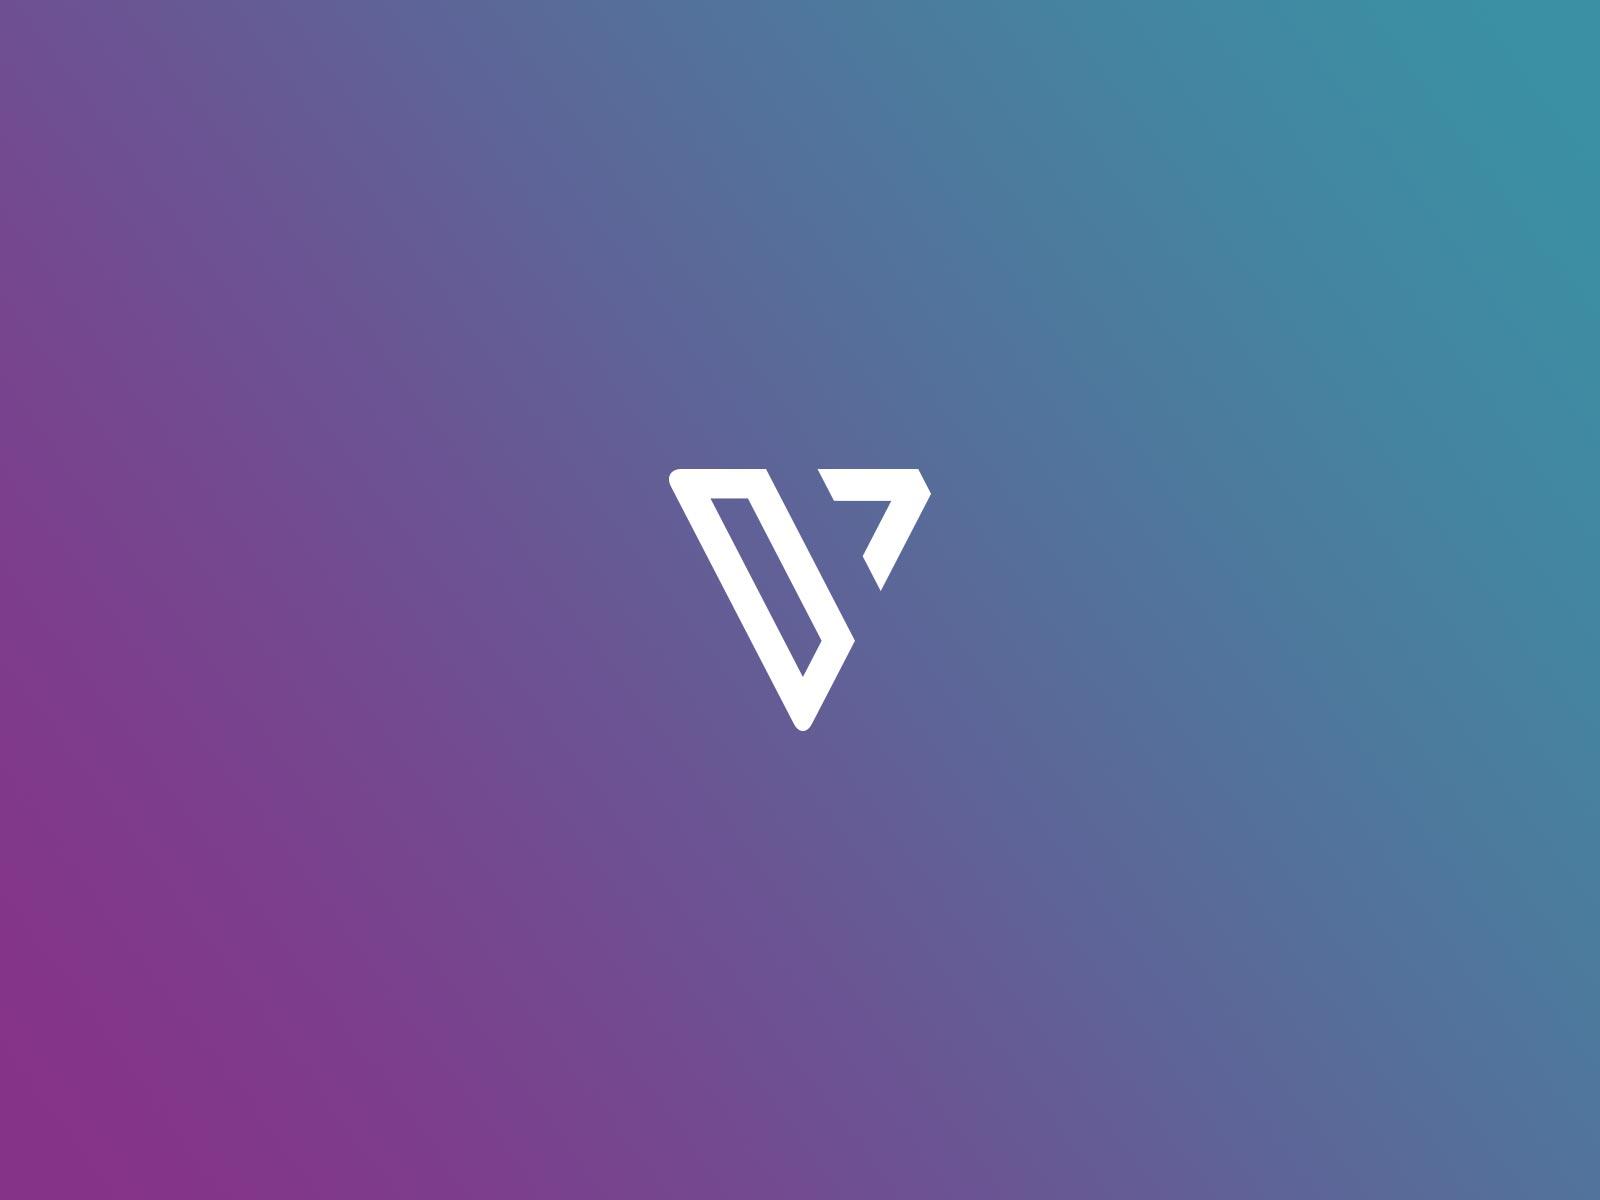 verifa V logo icon branding design